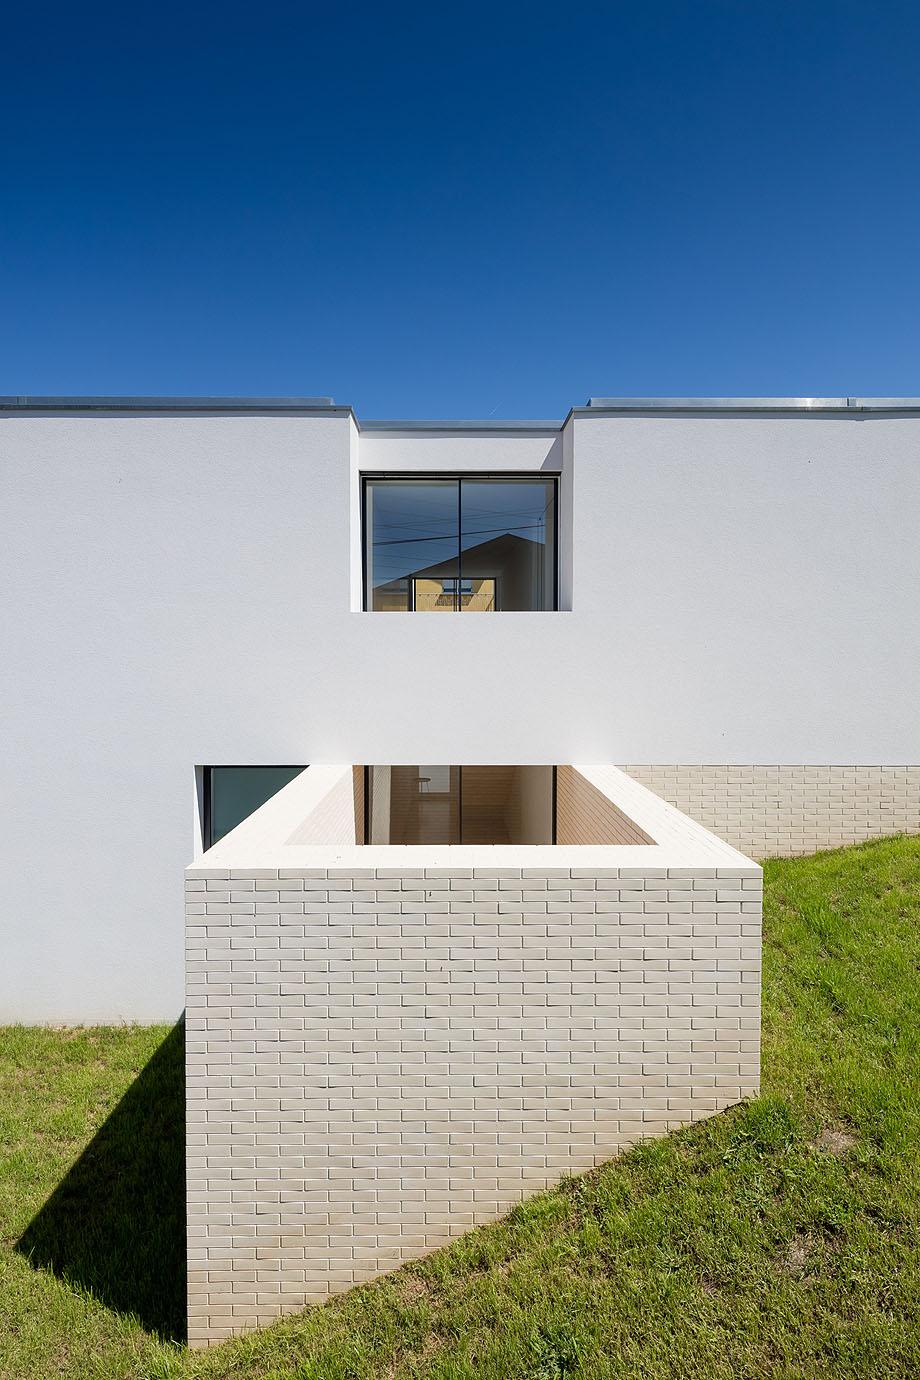 Casa Touguinha - Raulino Arquitecto (14)